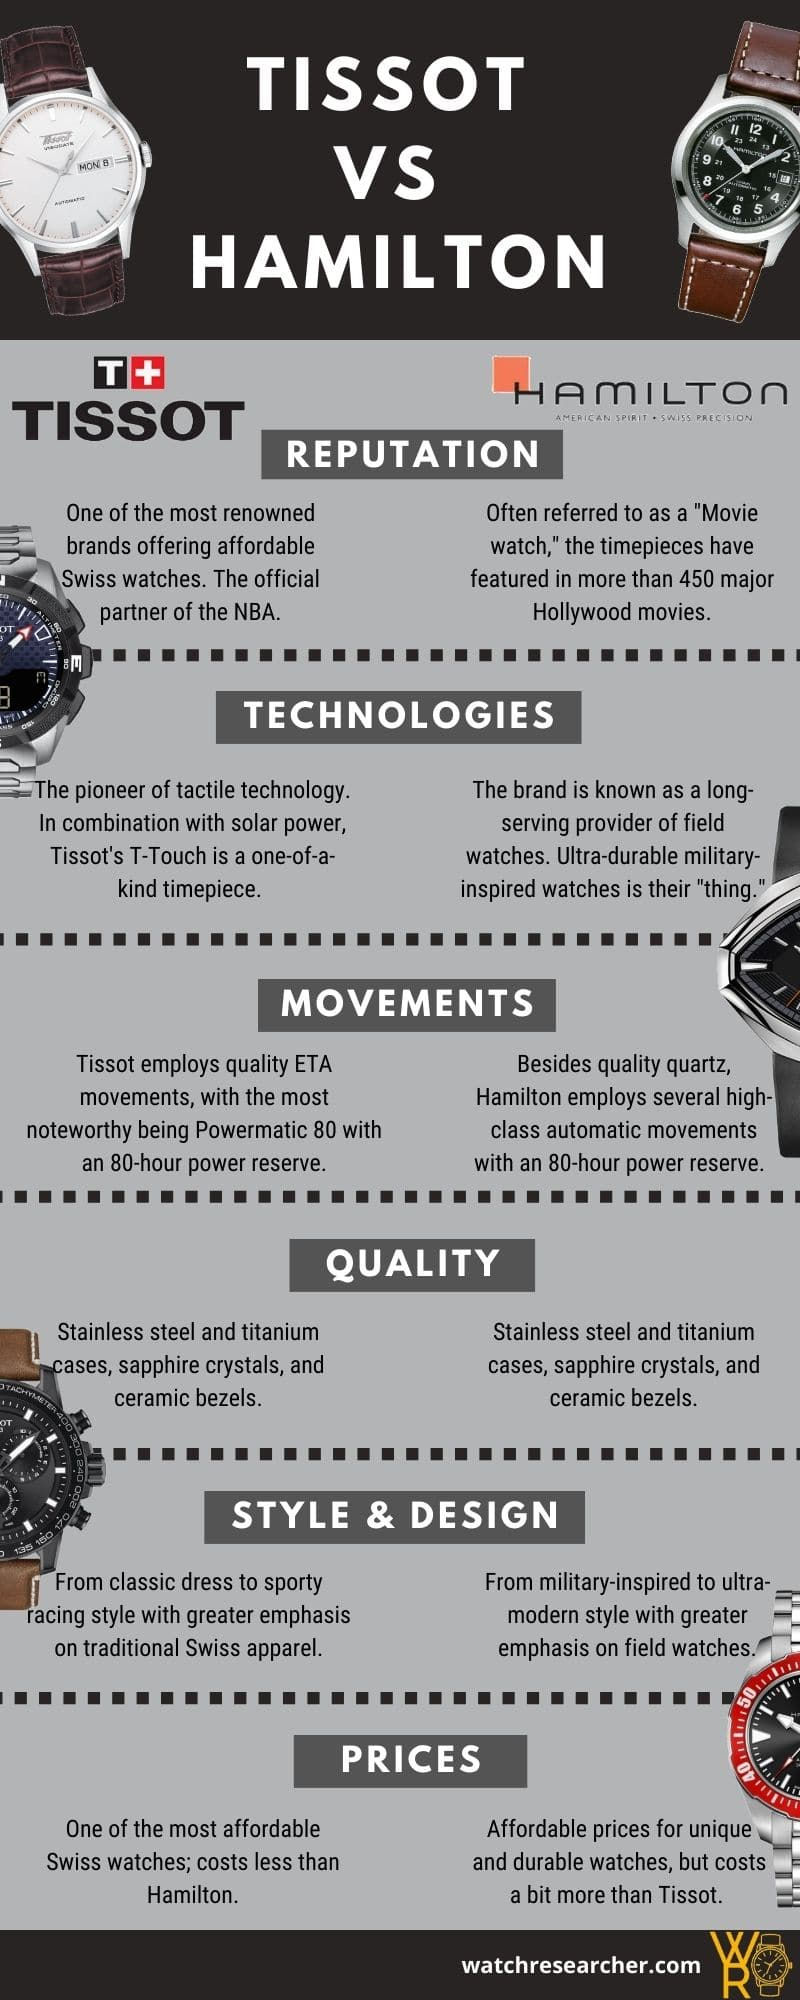 Tissot vs Hamilton Comparison